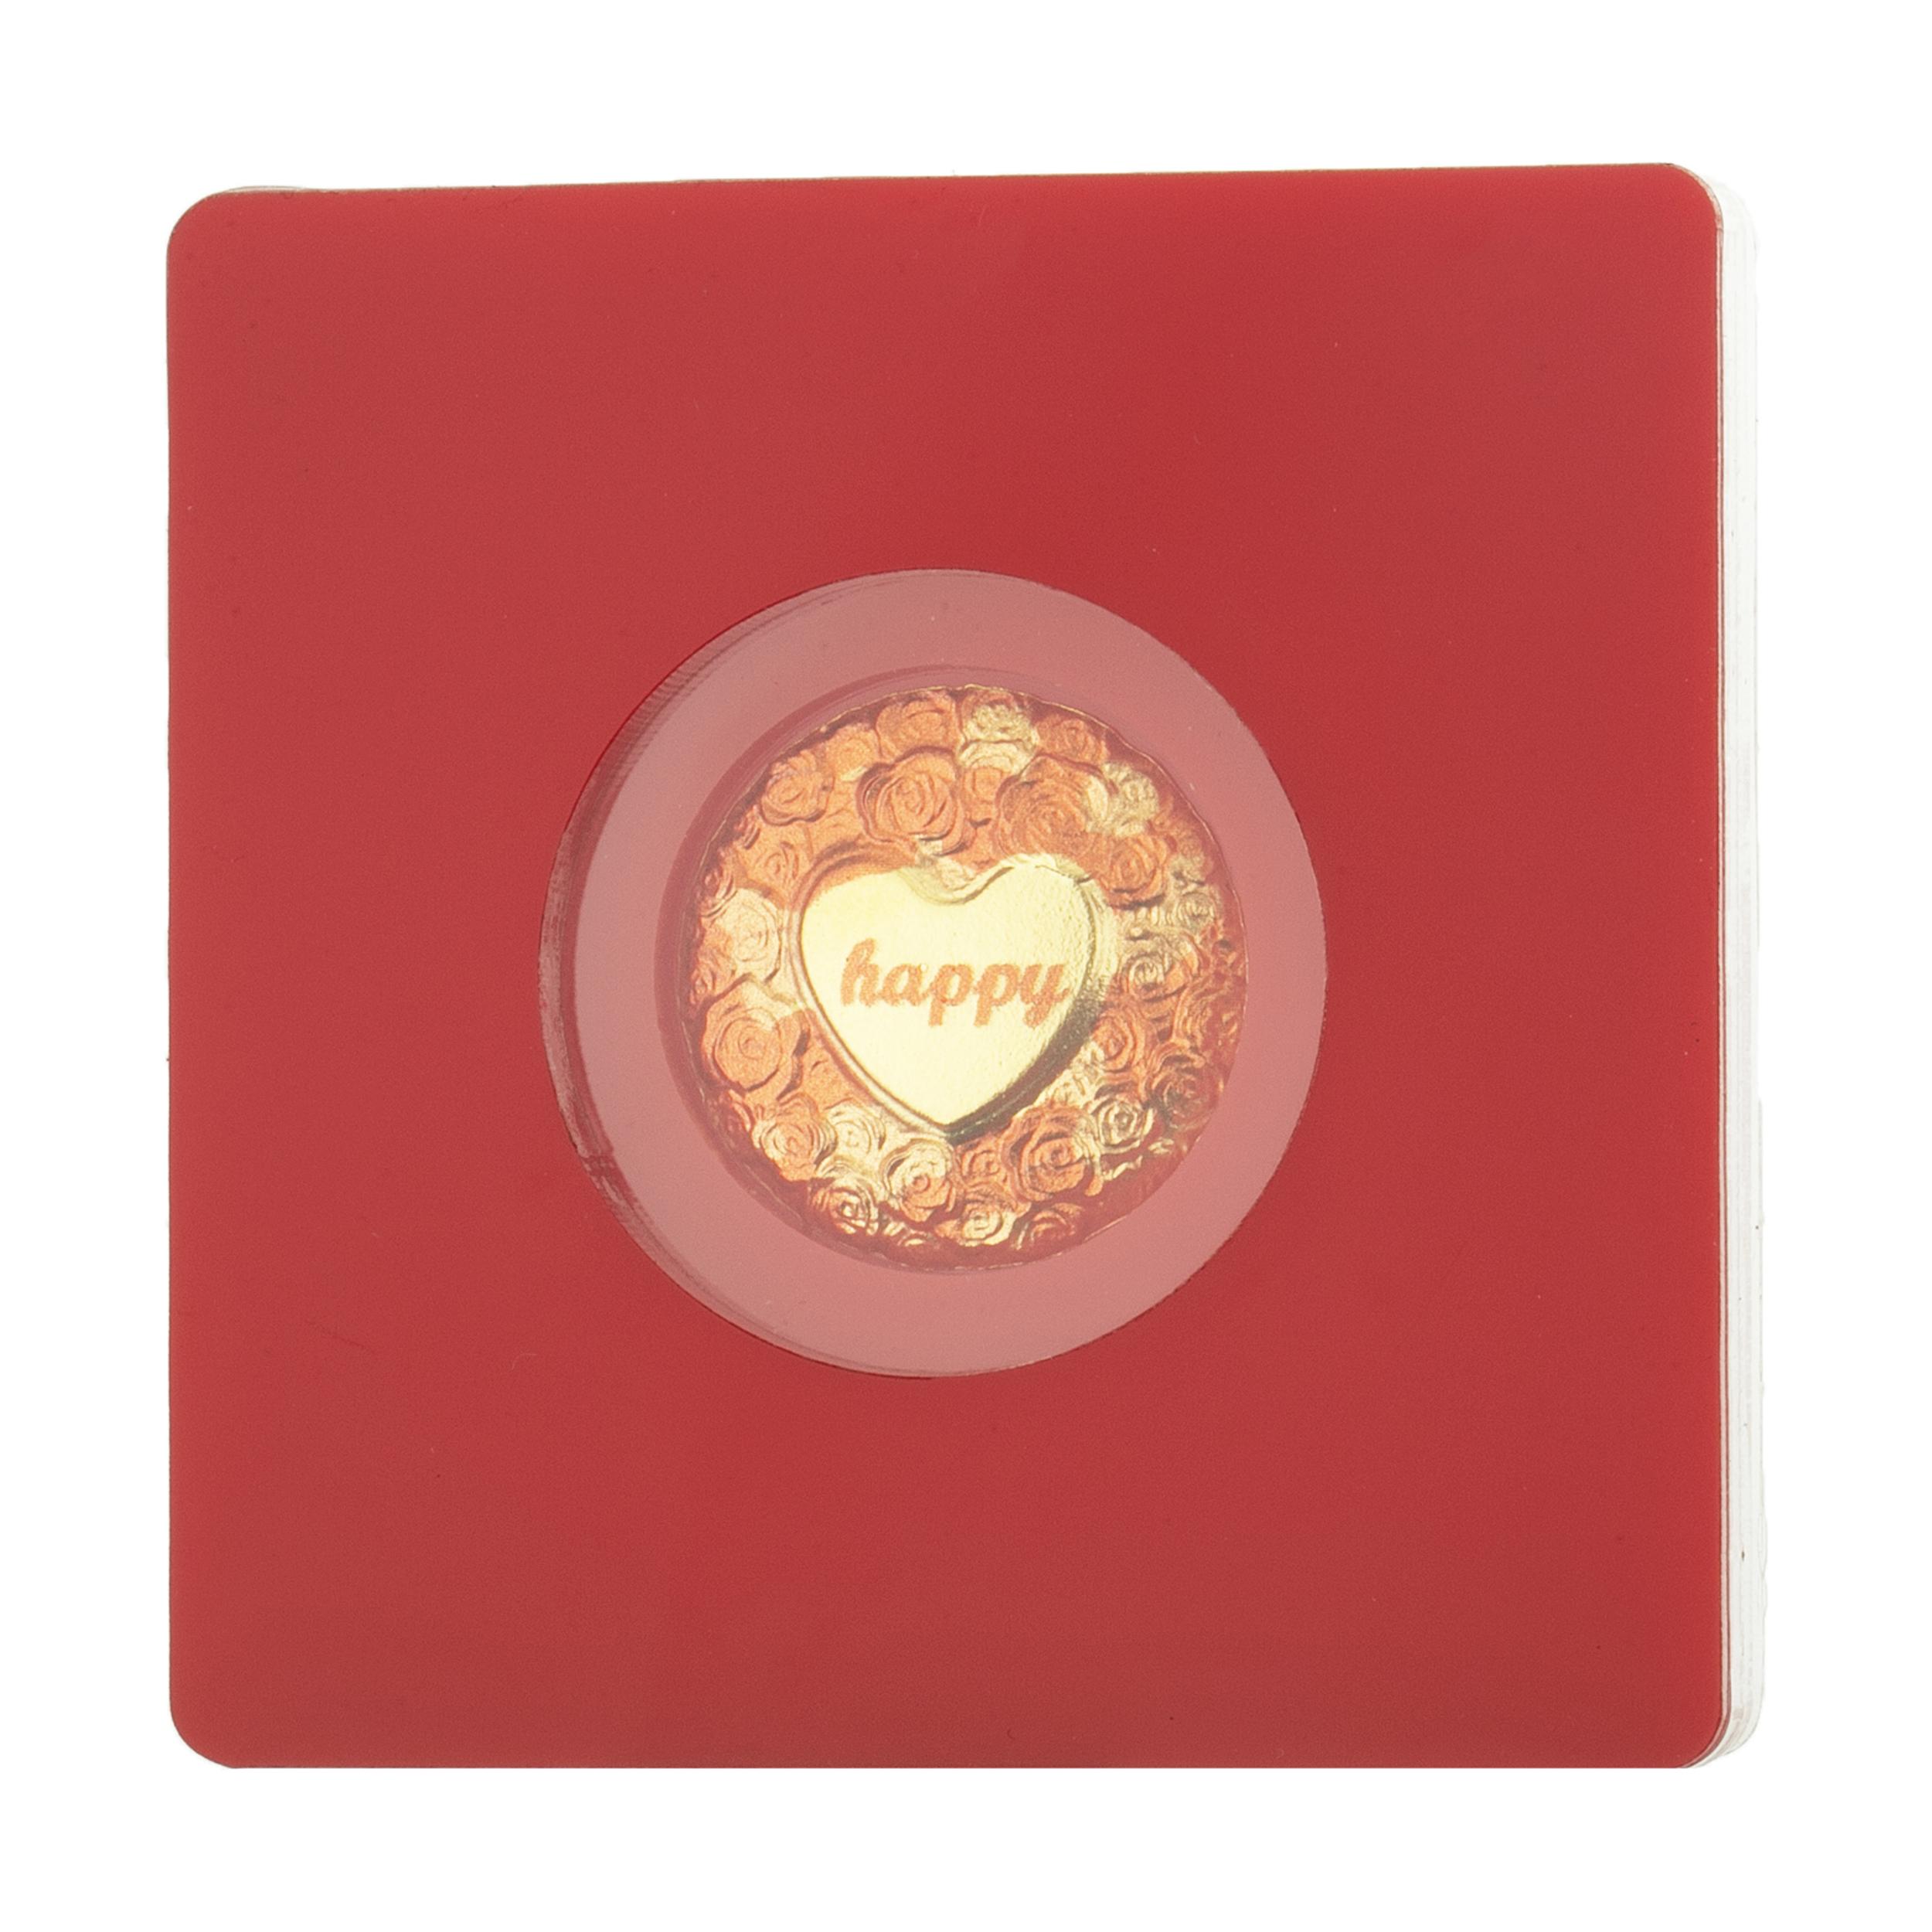 طلا گرمی 24 عیار پرنیا طرح قلب کد 003